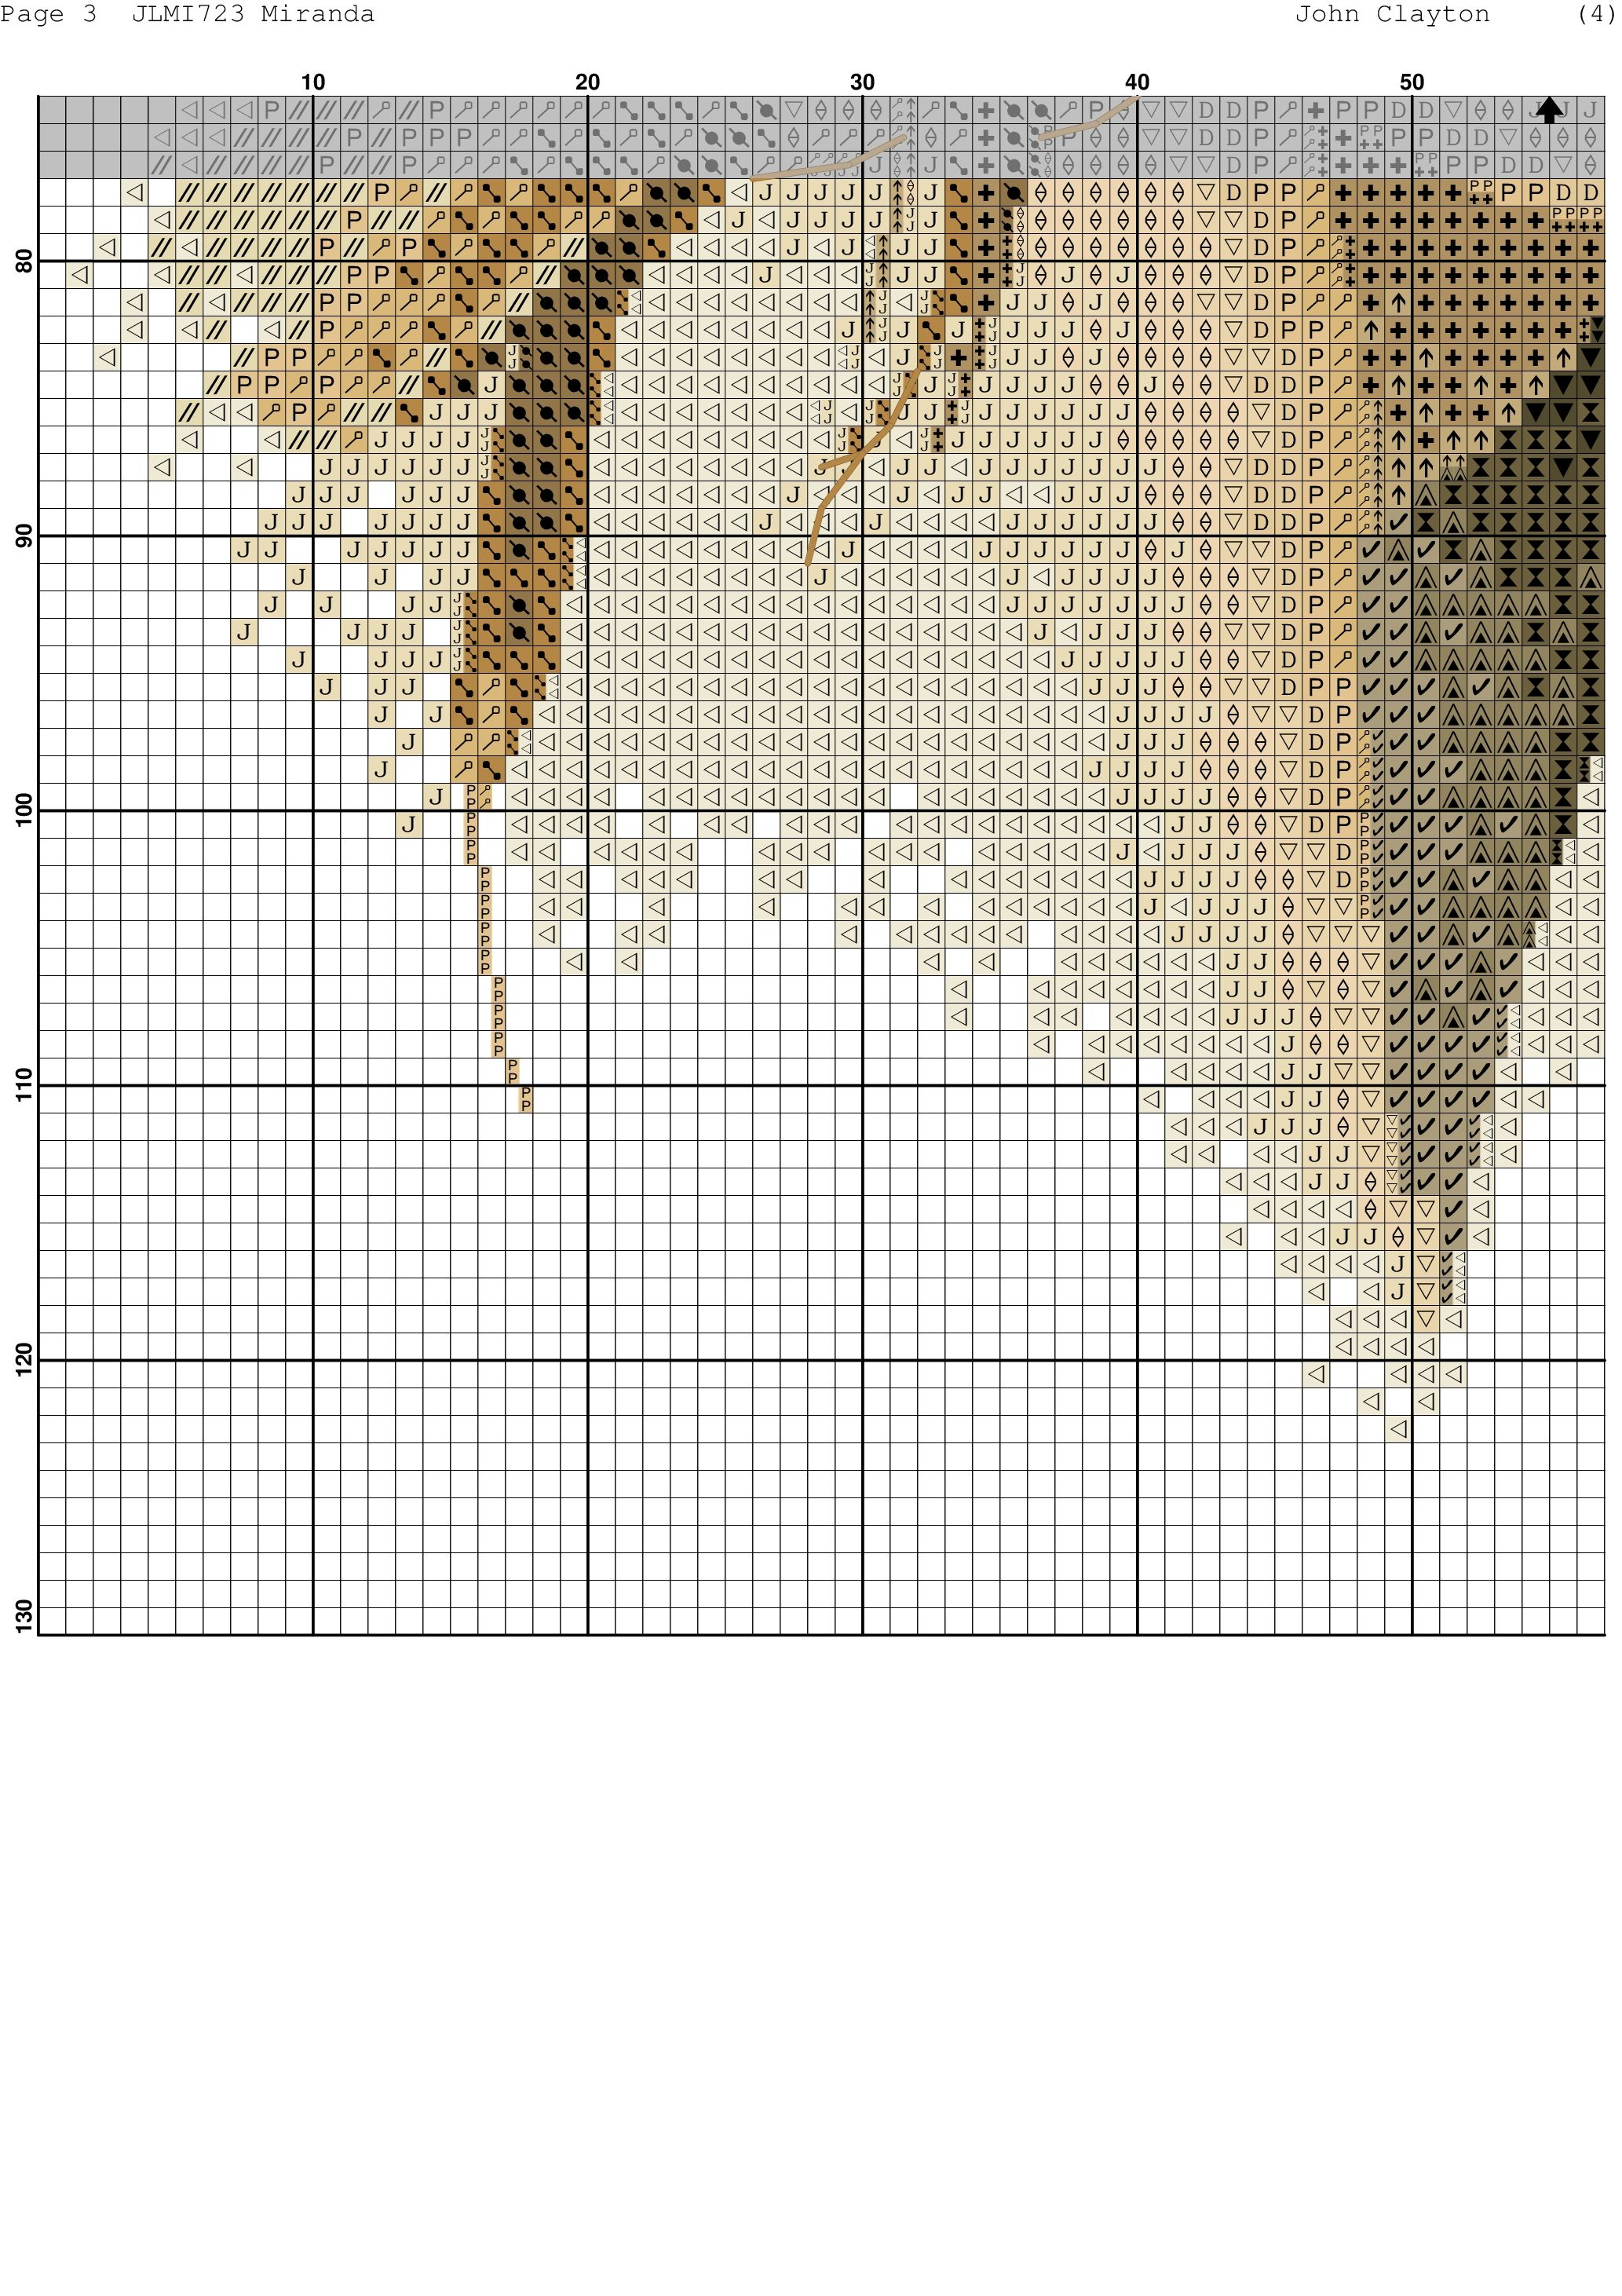 Pin von haydee blanco garcia auf punto de cruz cuadros | Pinterest